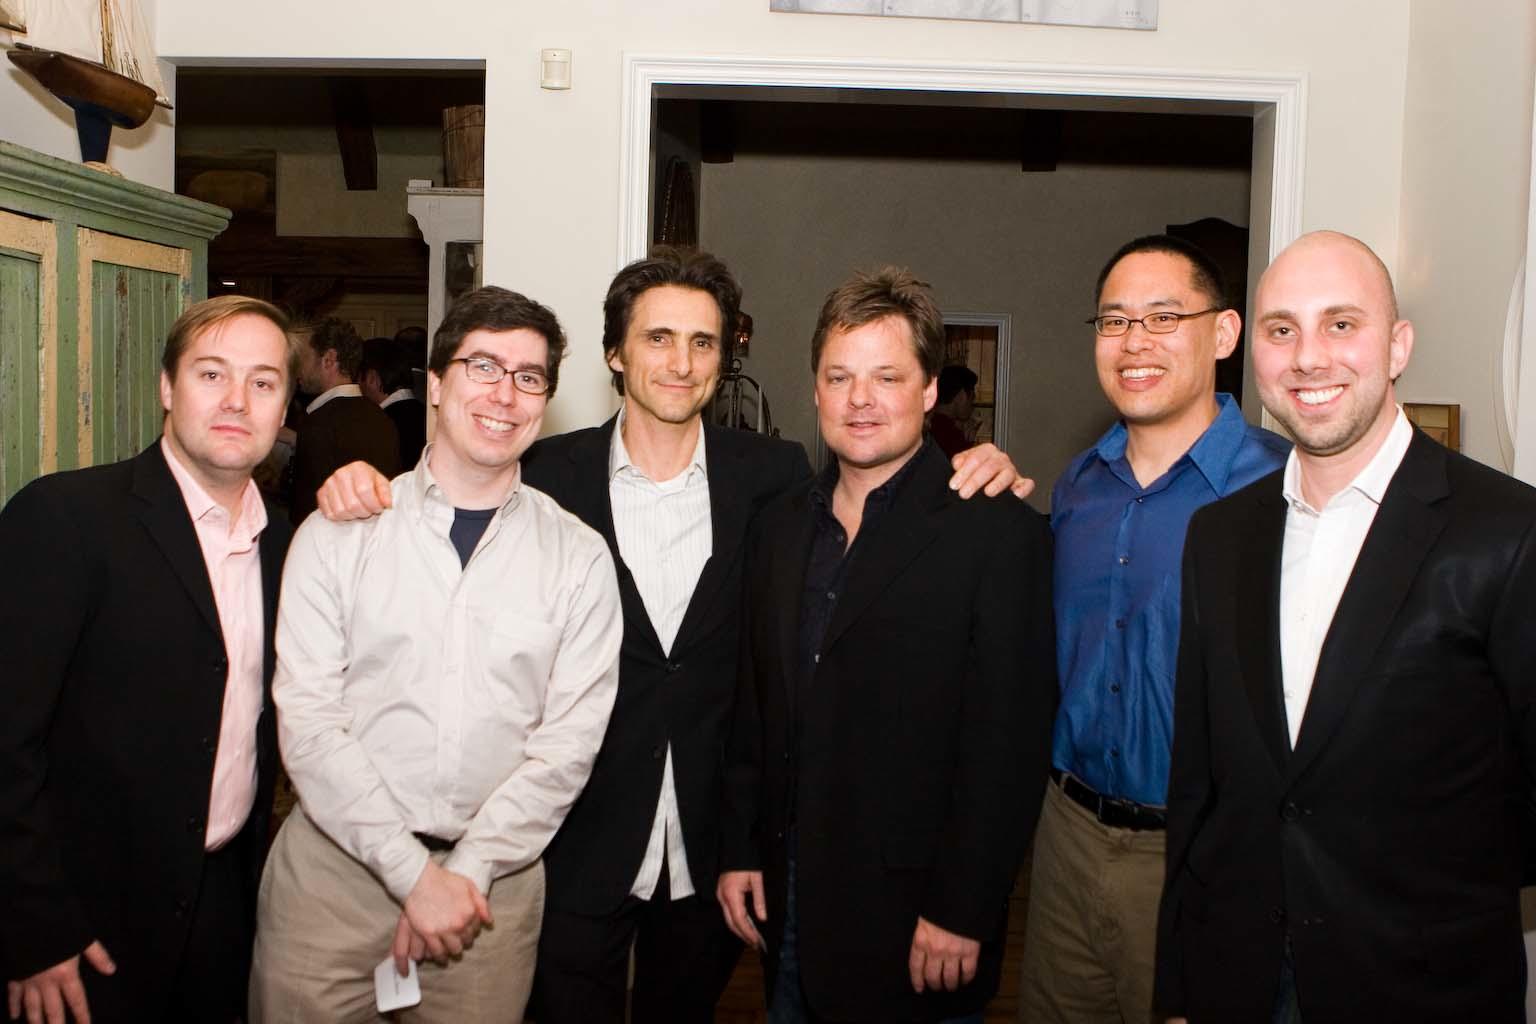 with Jason Calacanis, Harvard's Jonathan Zittrain, Yahoo's Scott Moore, and Stephen Hsu @ Censoring The Internet